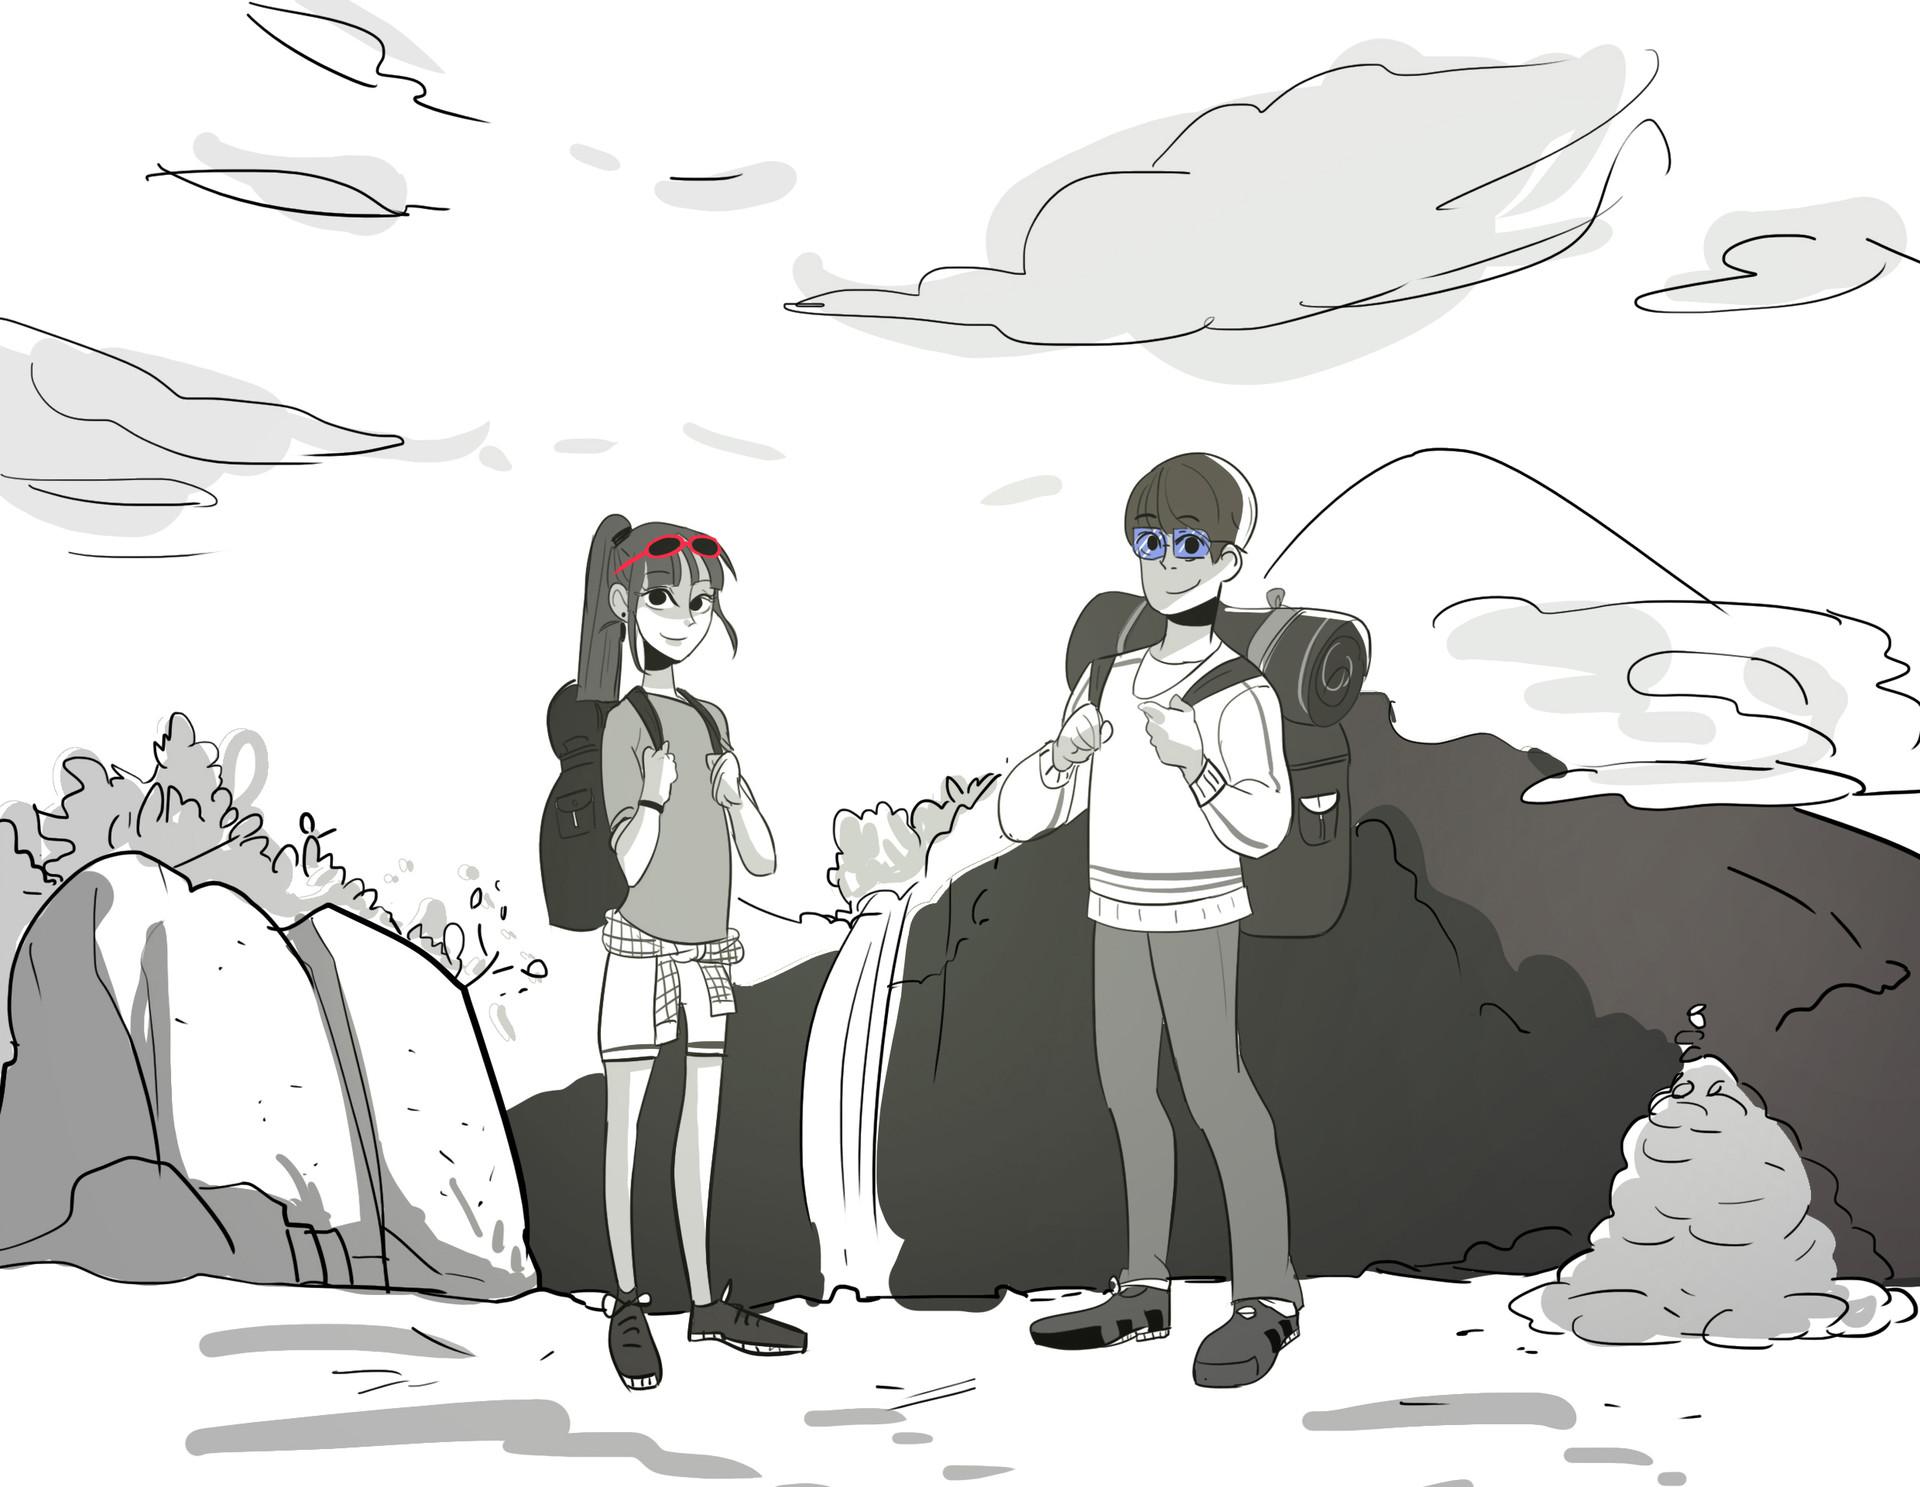 Seungyeop lee 10